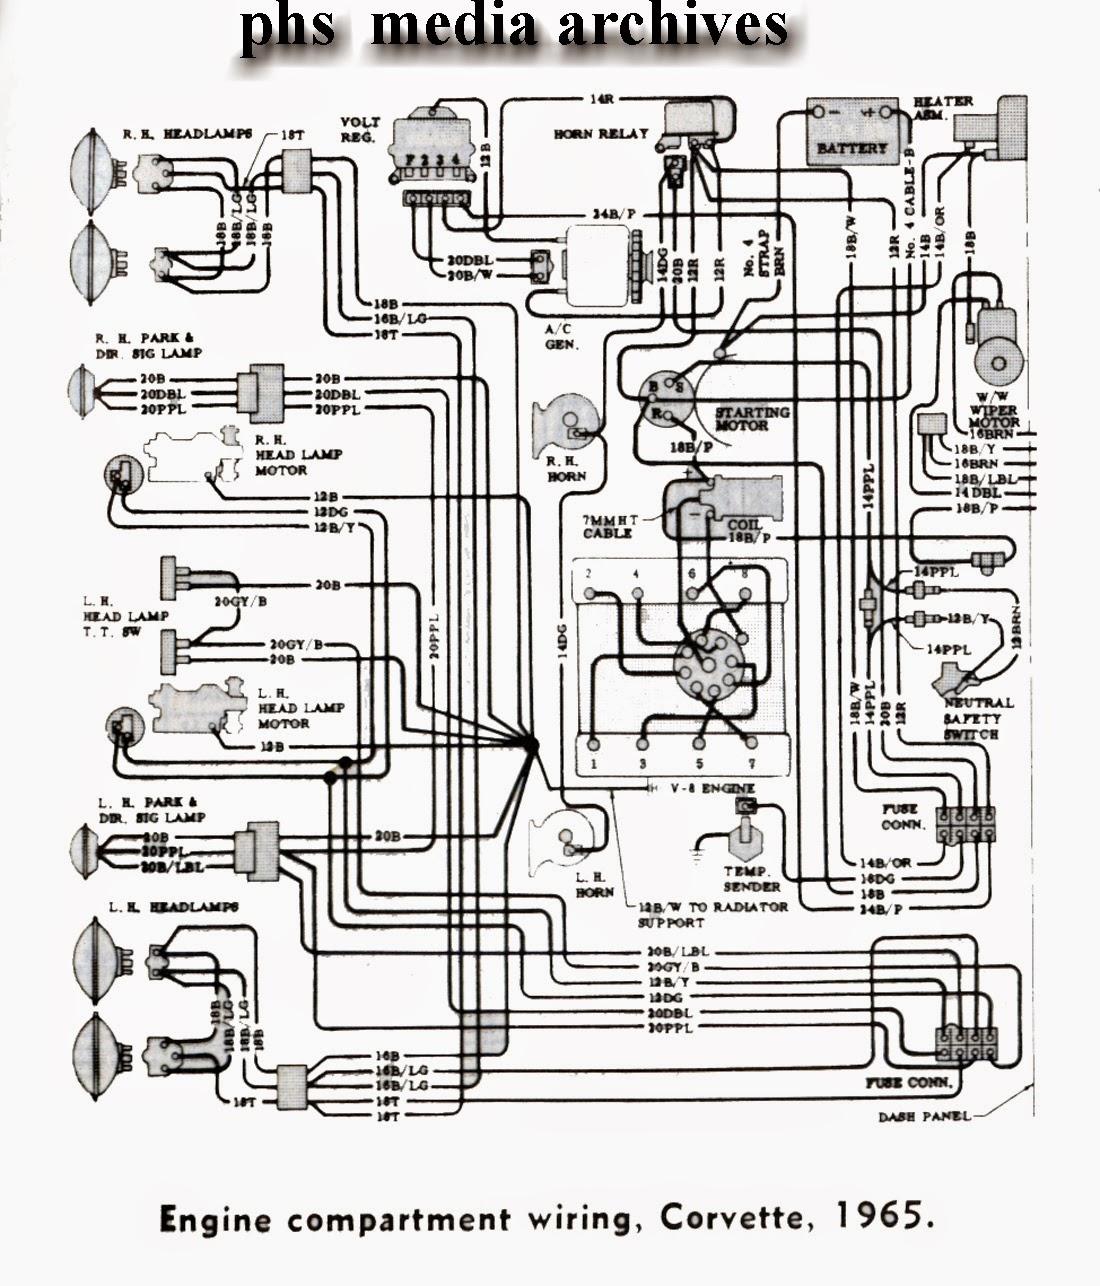 1976 Camaro Wiring Diagram Detailed Schematic Diagrams 1978 Heater Core 1971 Hvac Control System Design 1975 Trans Am